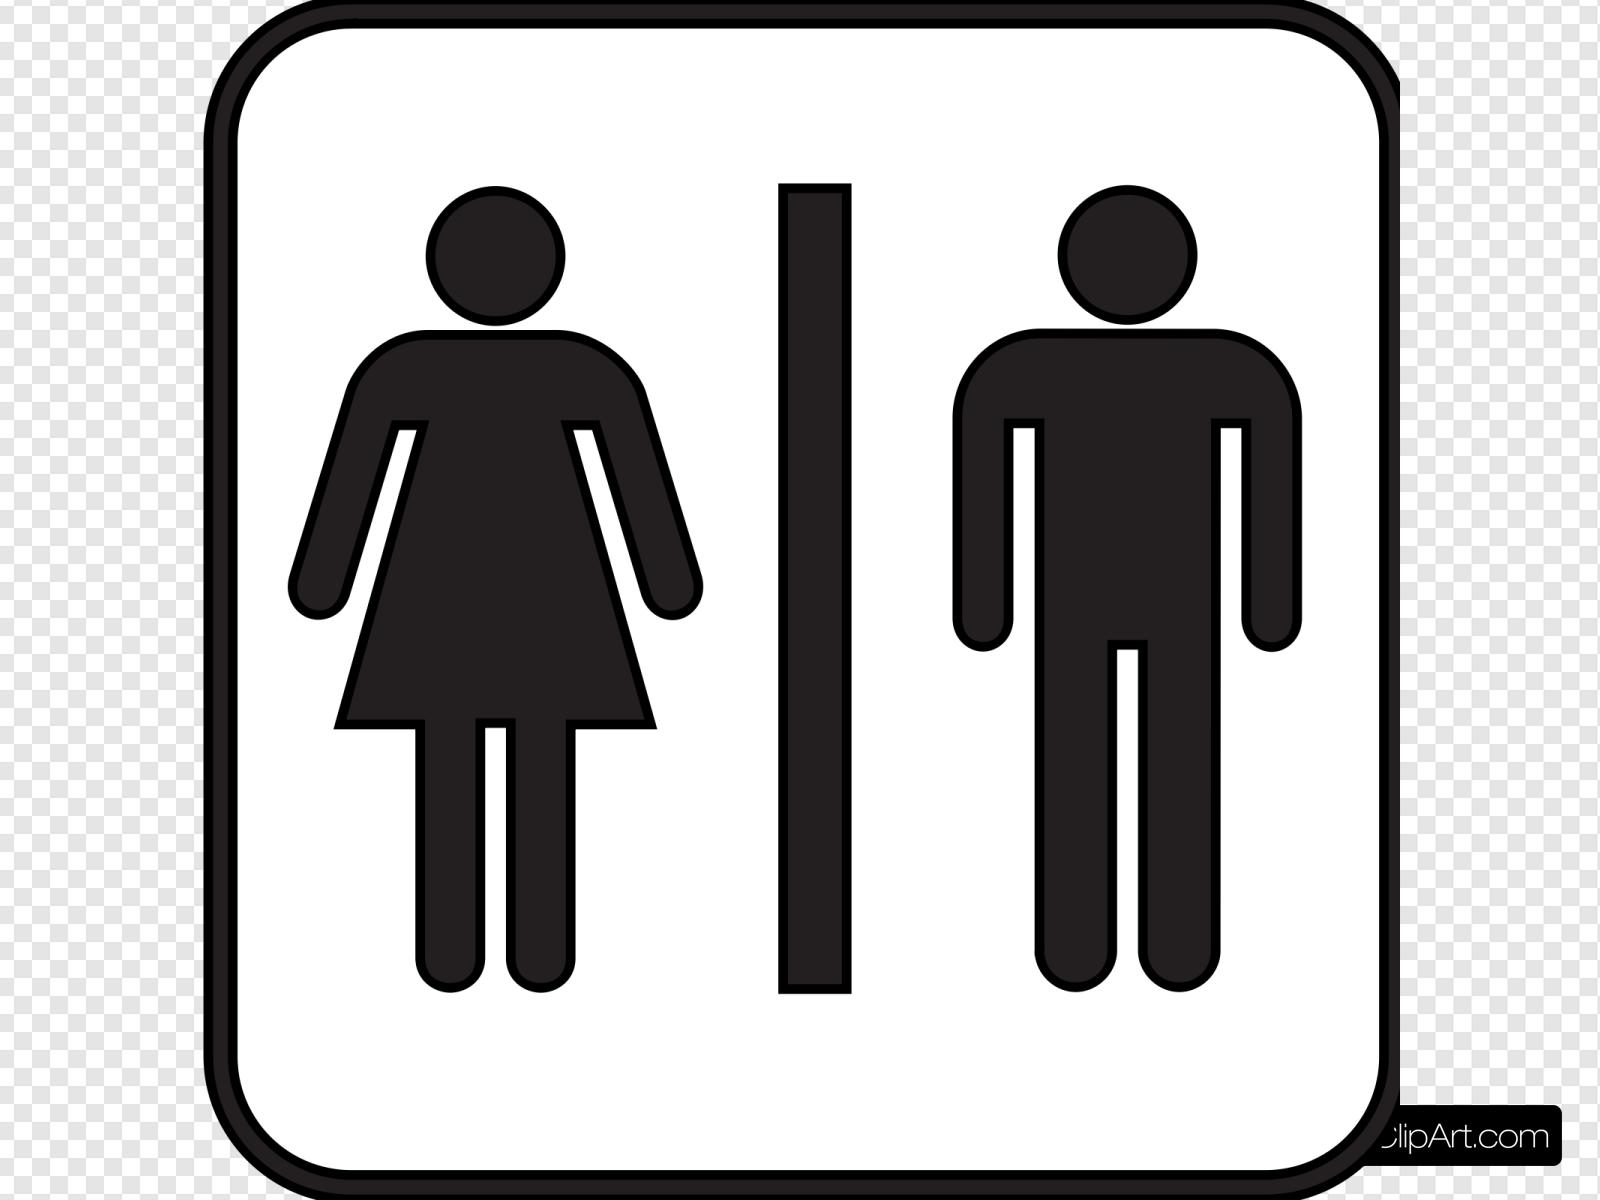 Woman Man Bathroom Clip art, Icon and SVG.